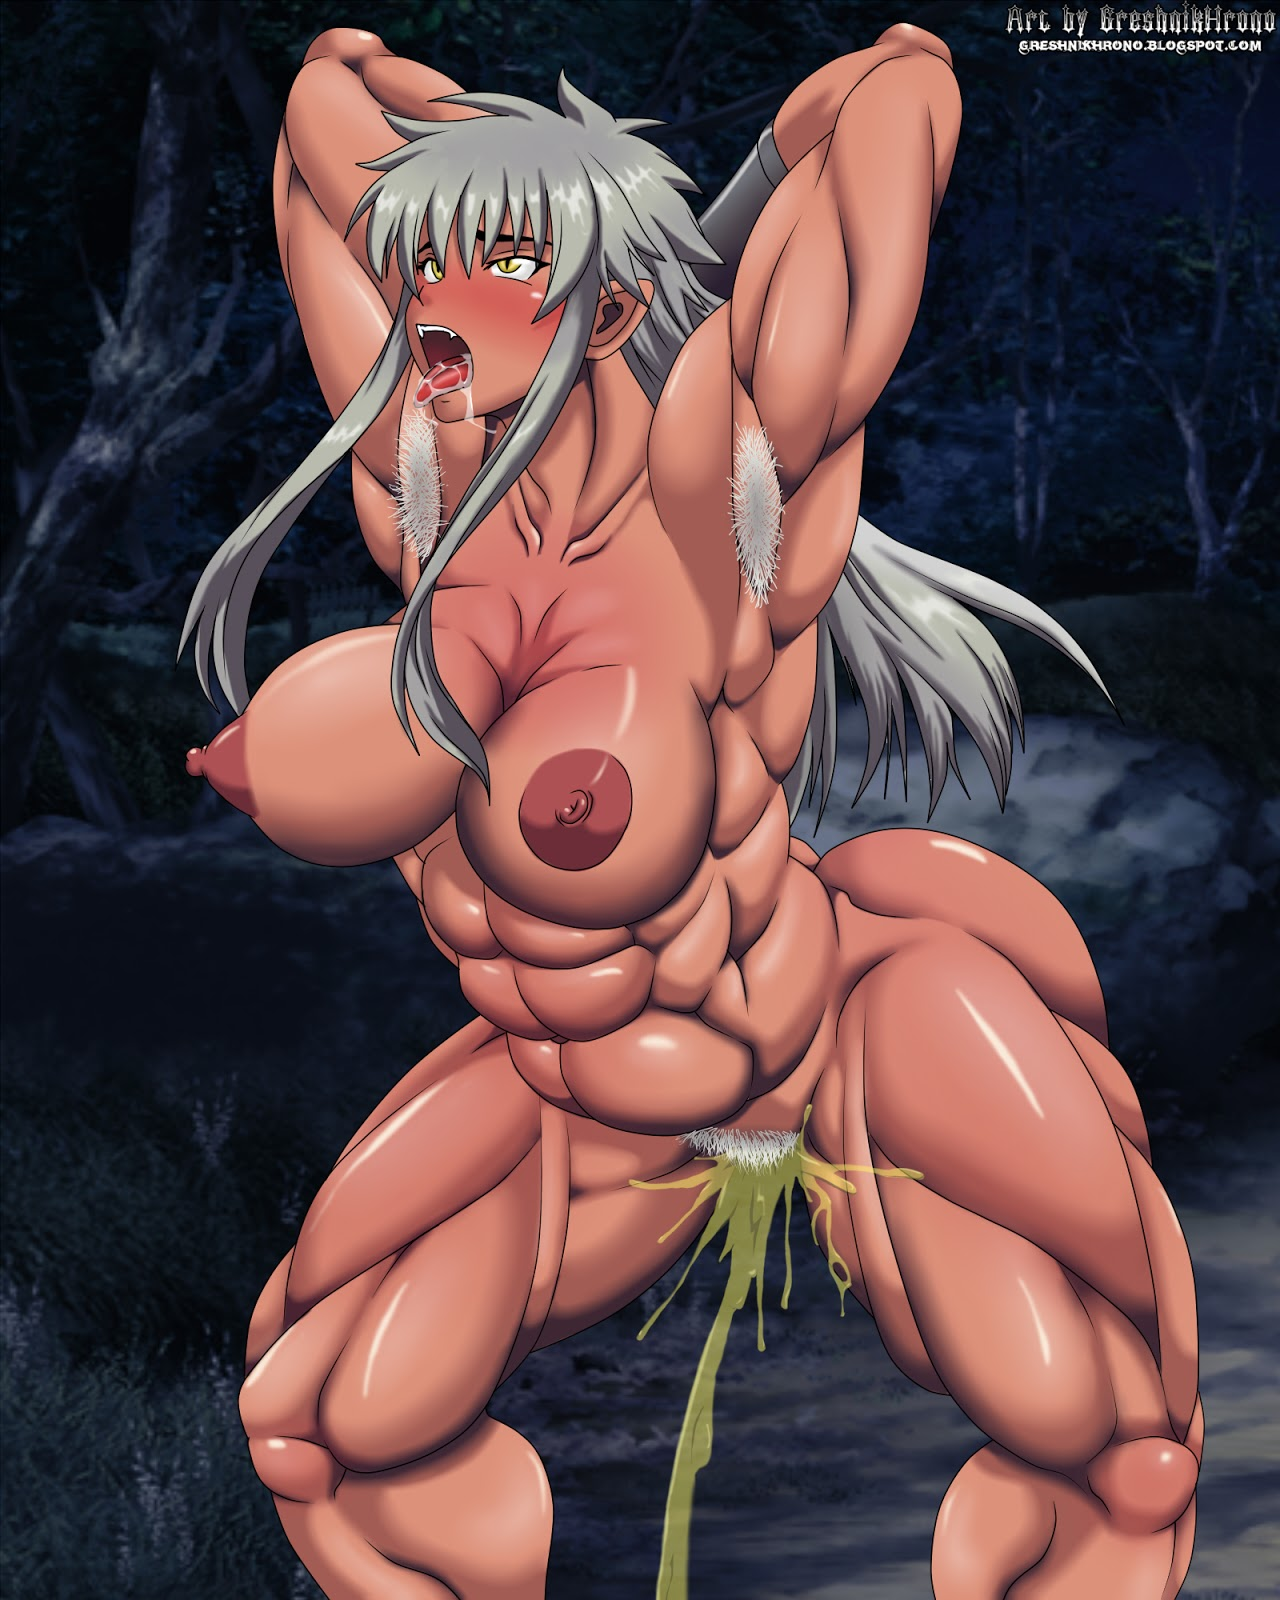 Muscle Women Porn muscle women hentai datawav | free hot nude porn pic gallery